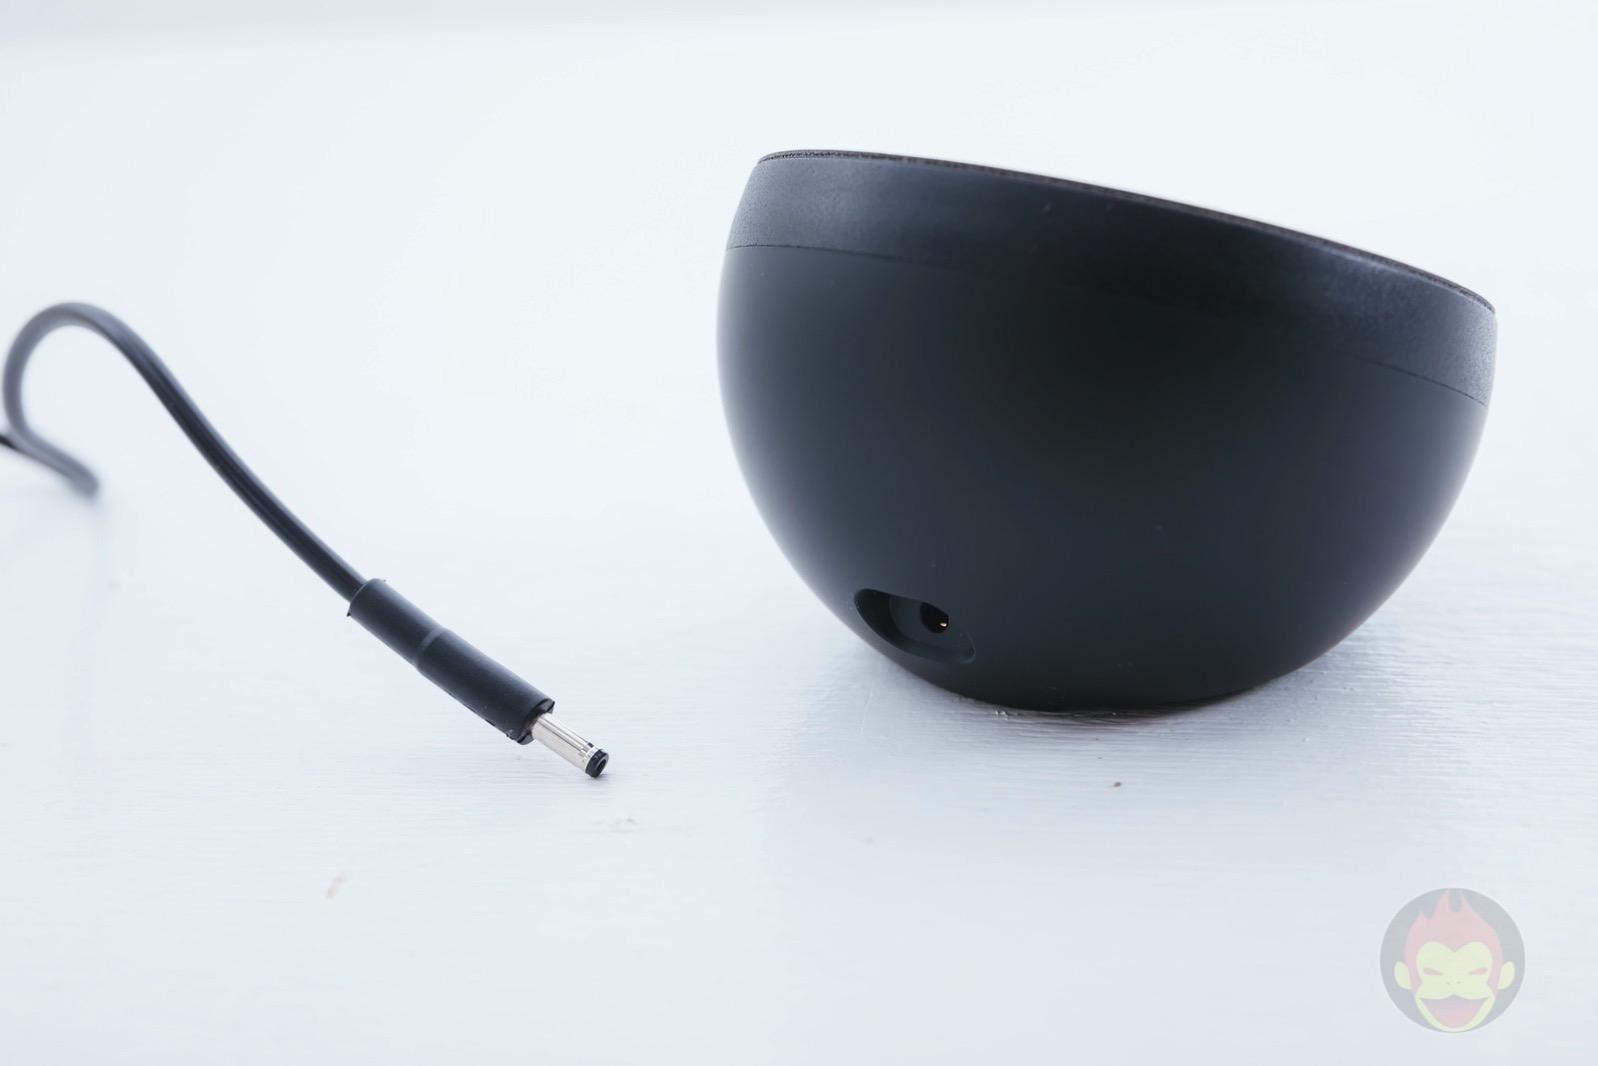 Freedy-Flex-EA1203-Wireless-Charger-Review-03.jpg